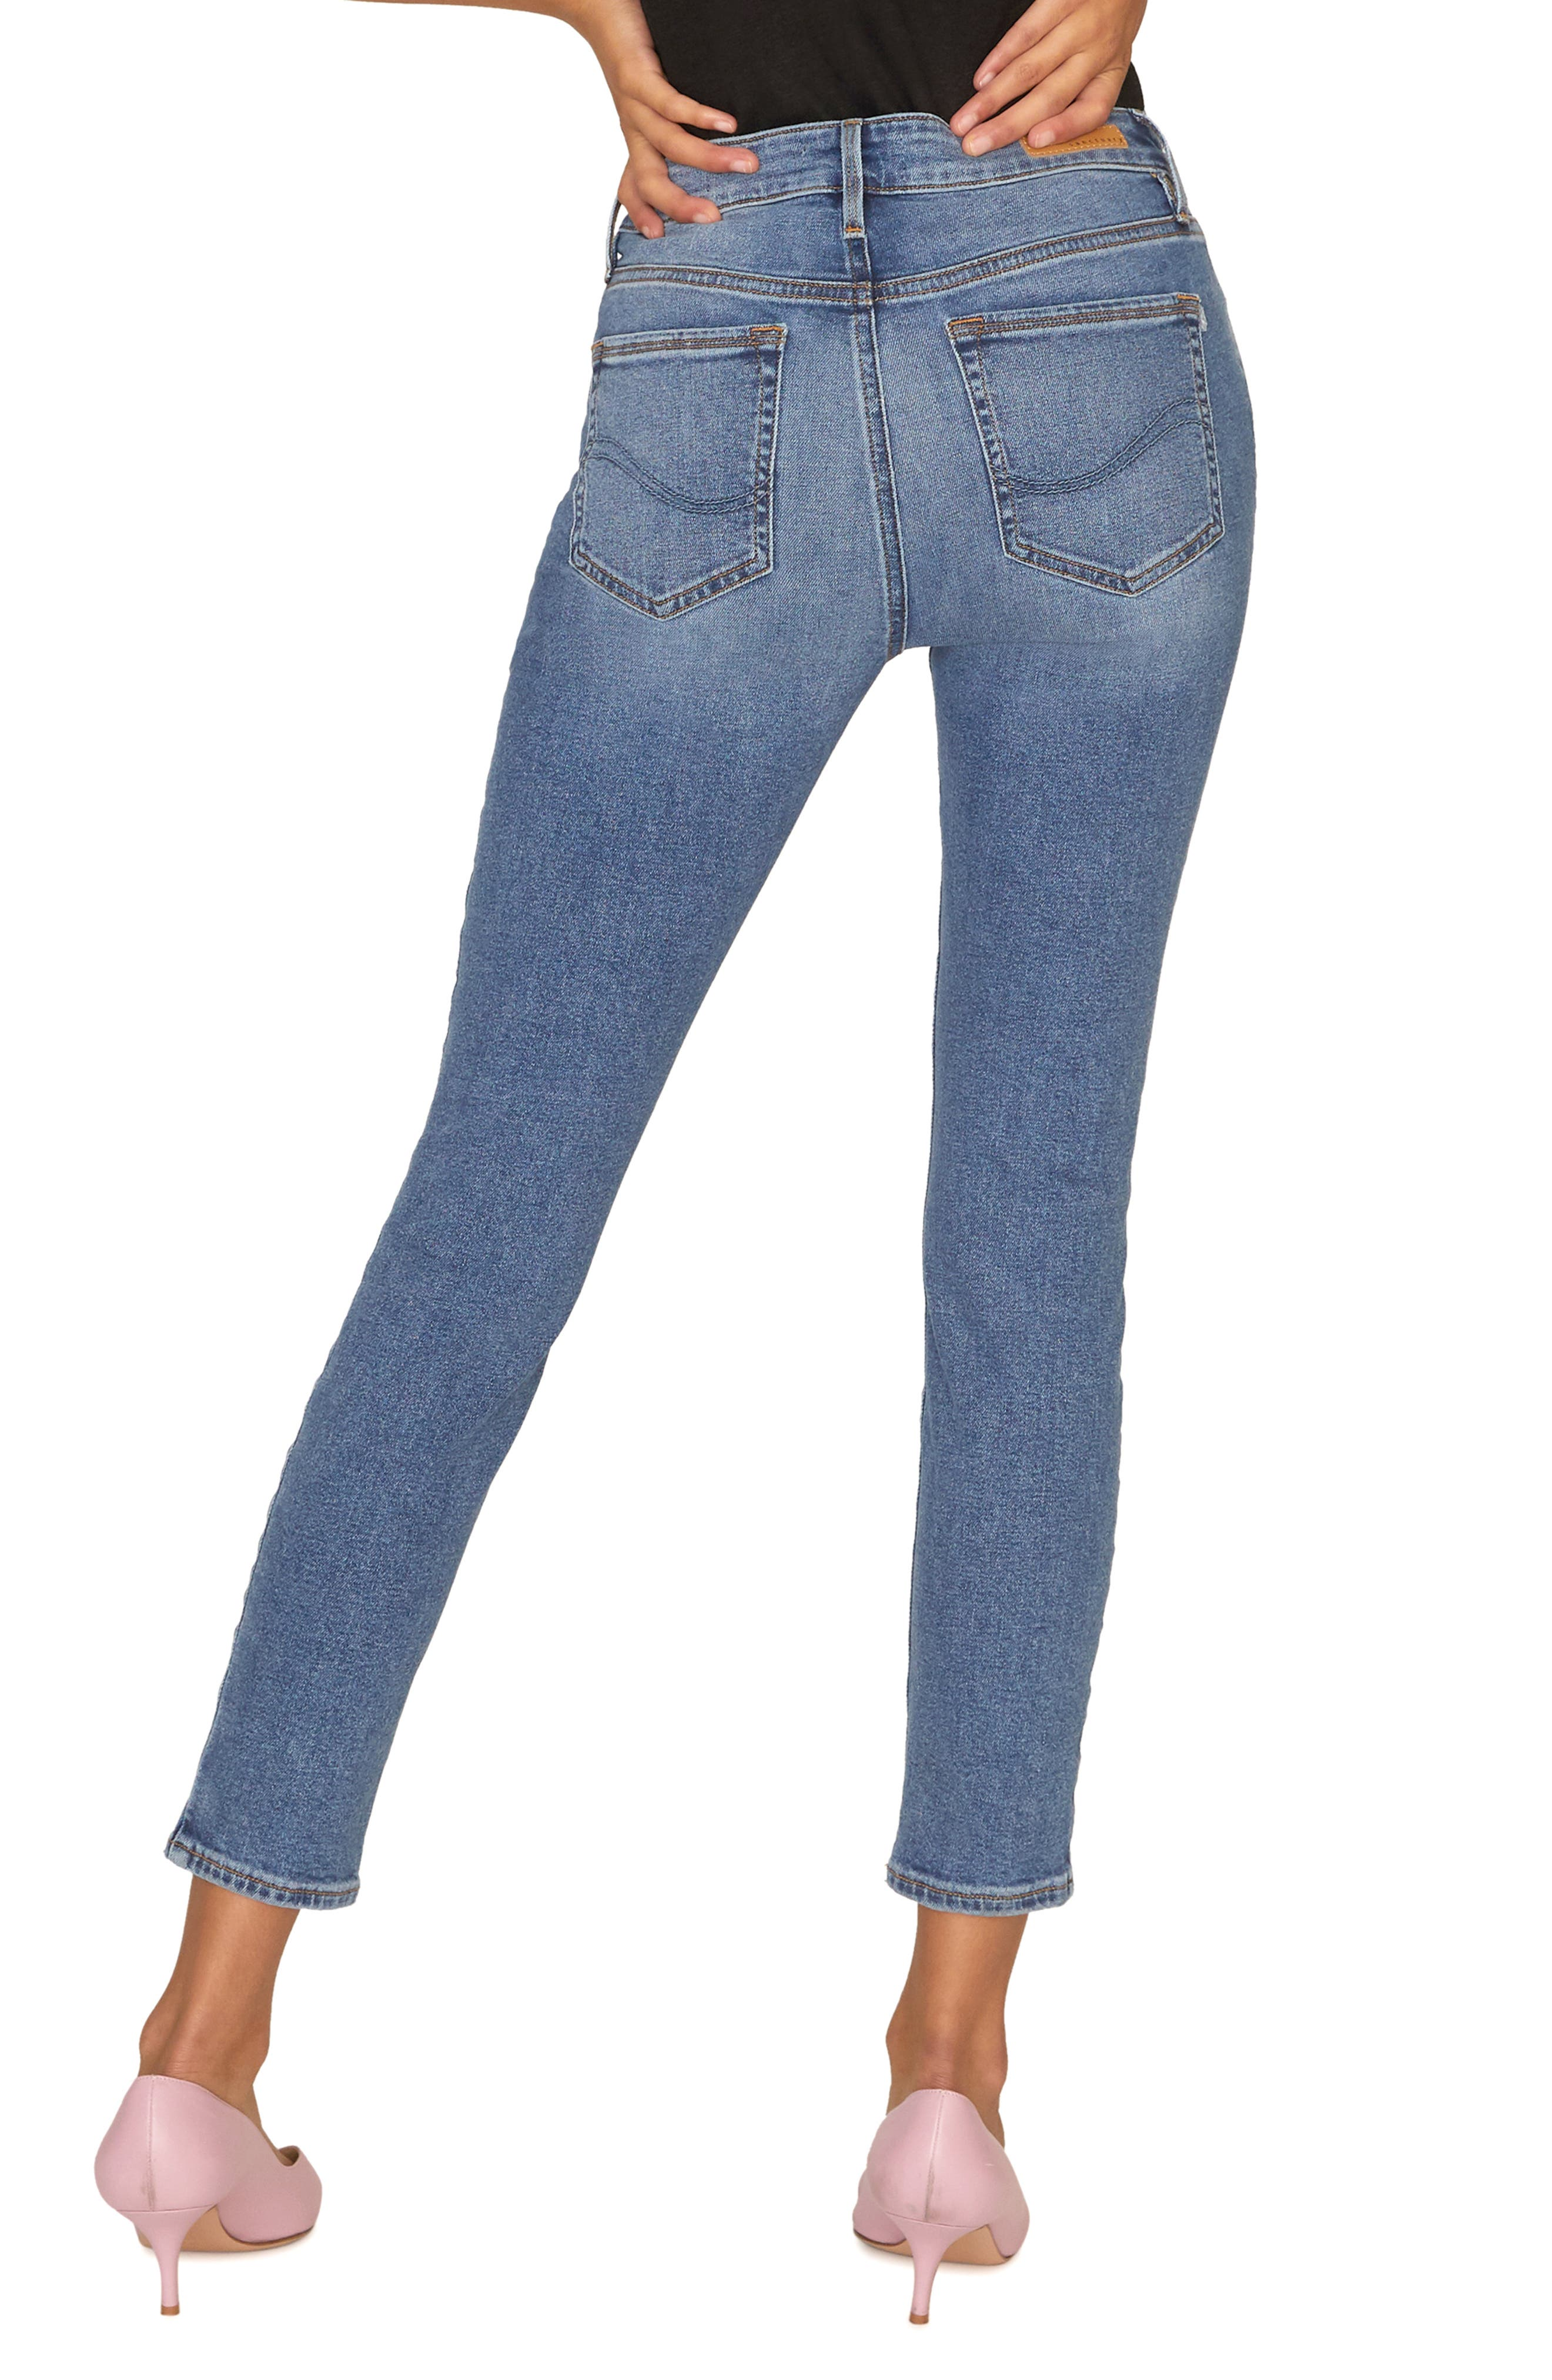 SANCTUARY, Social Standard Ankle Skinny Jeans, Alternate thumbnail 2, color, 422